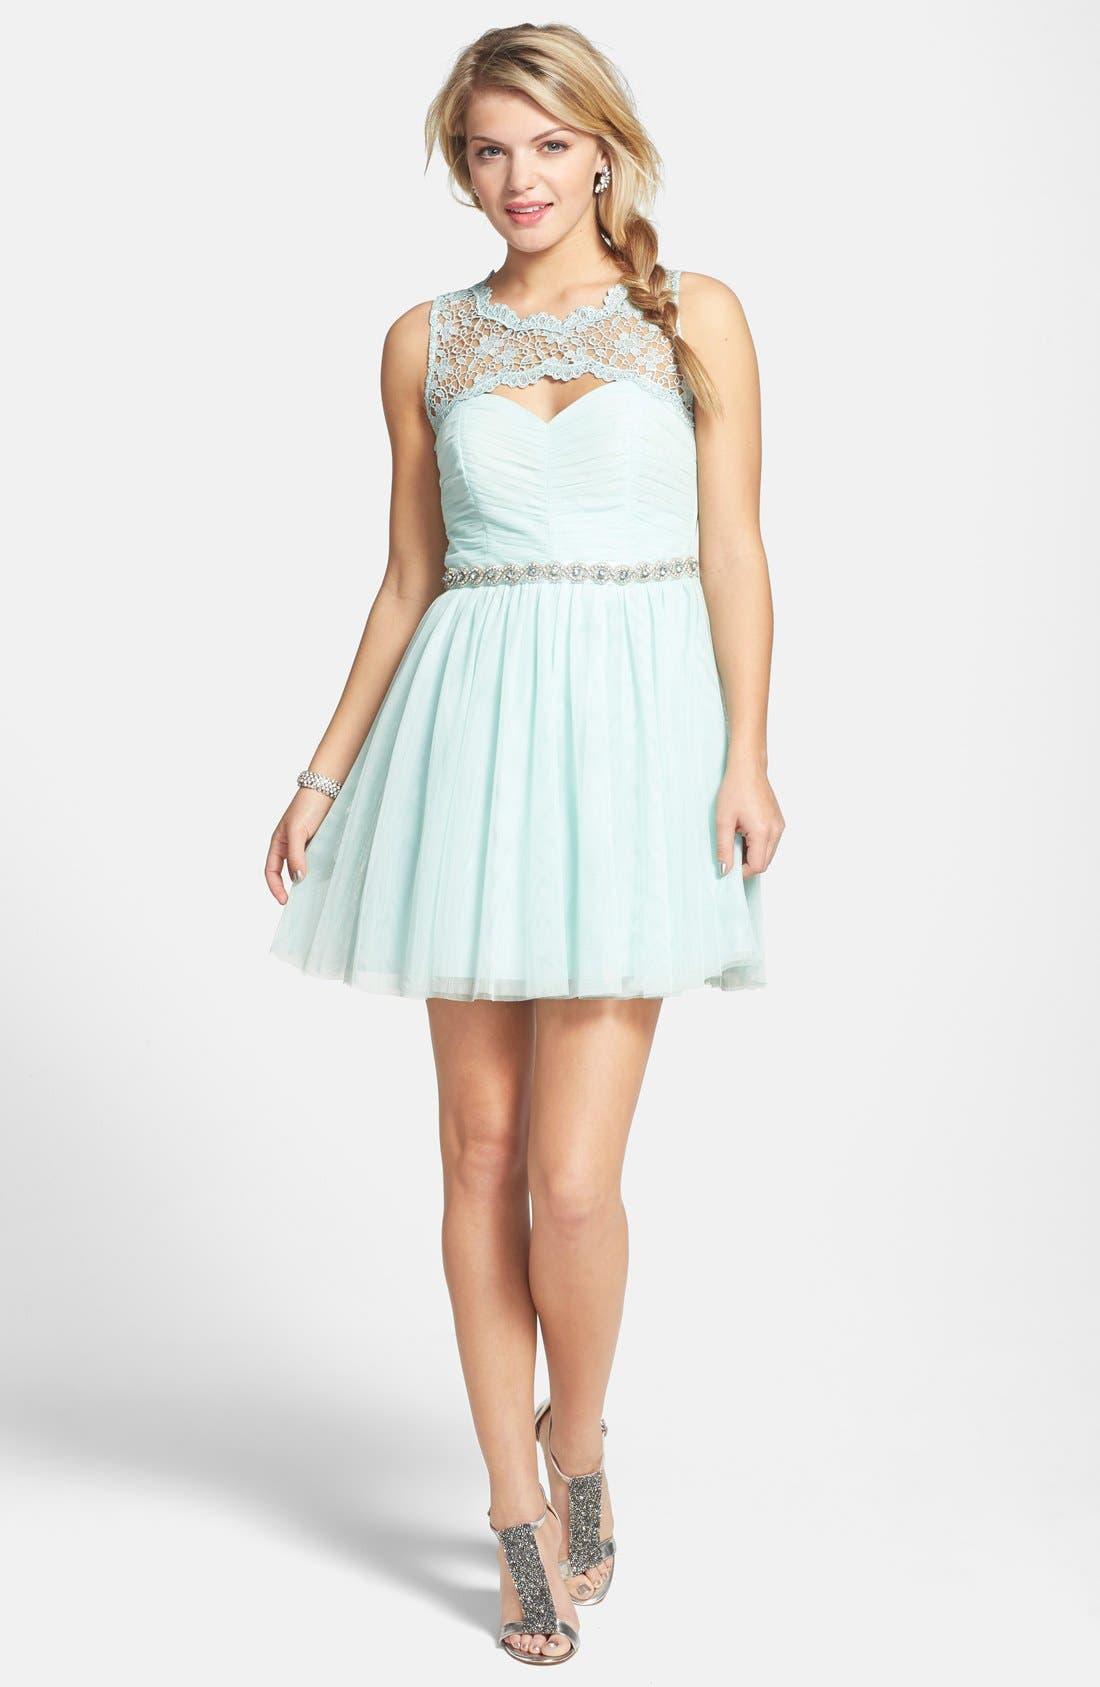 Alternate Image 1 Selected - Sequin Hearts Embellished Dress (Juniors)